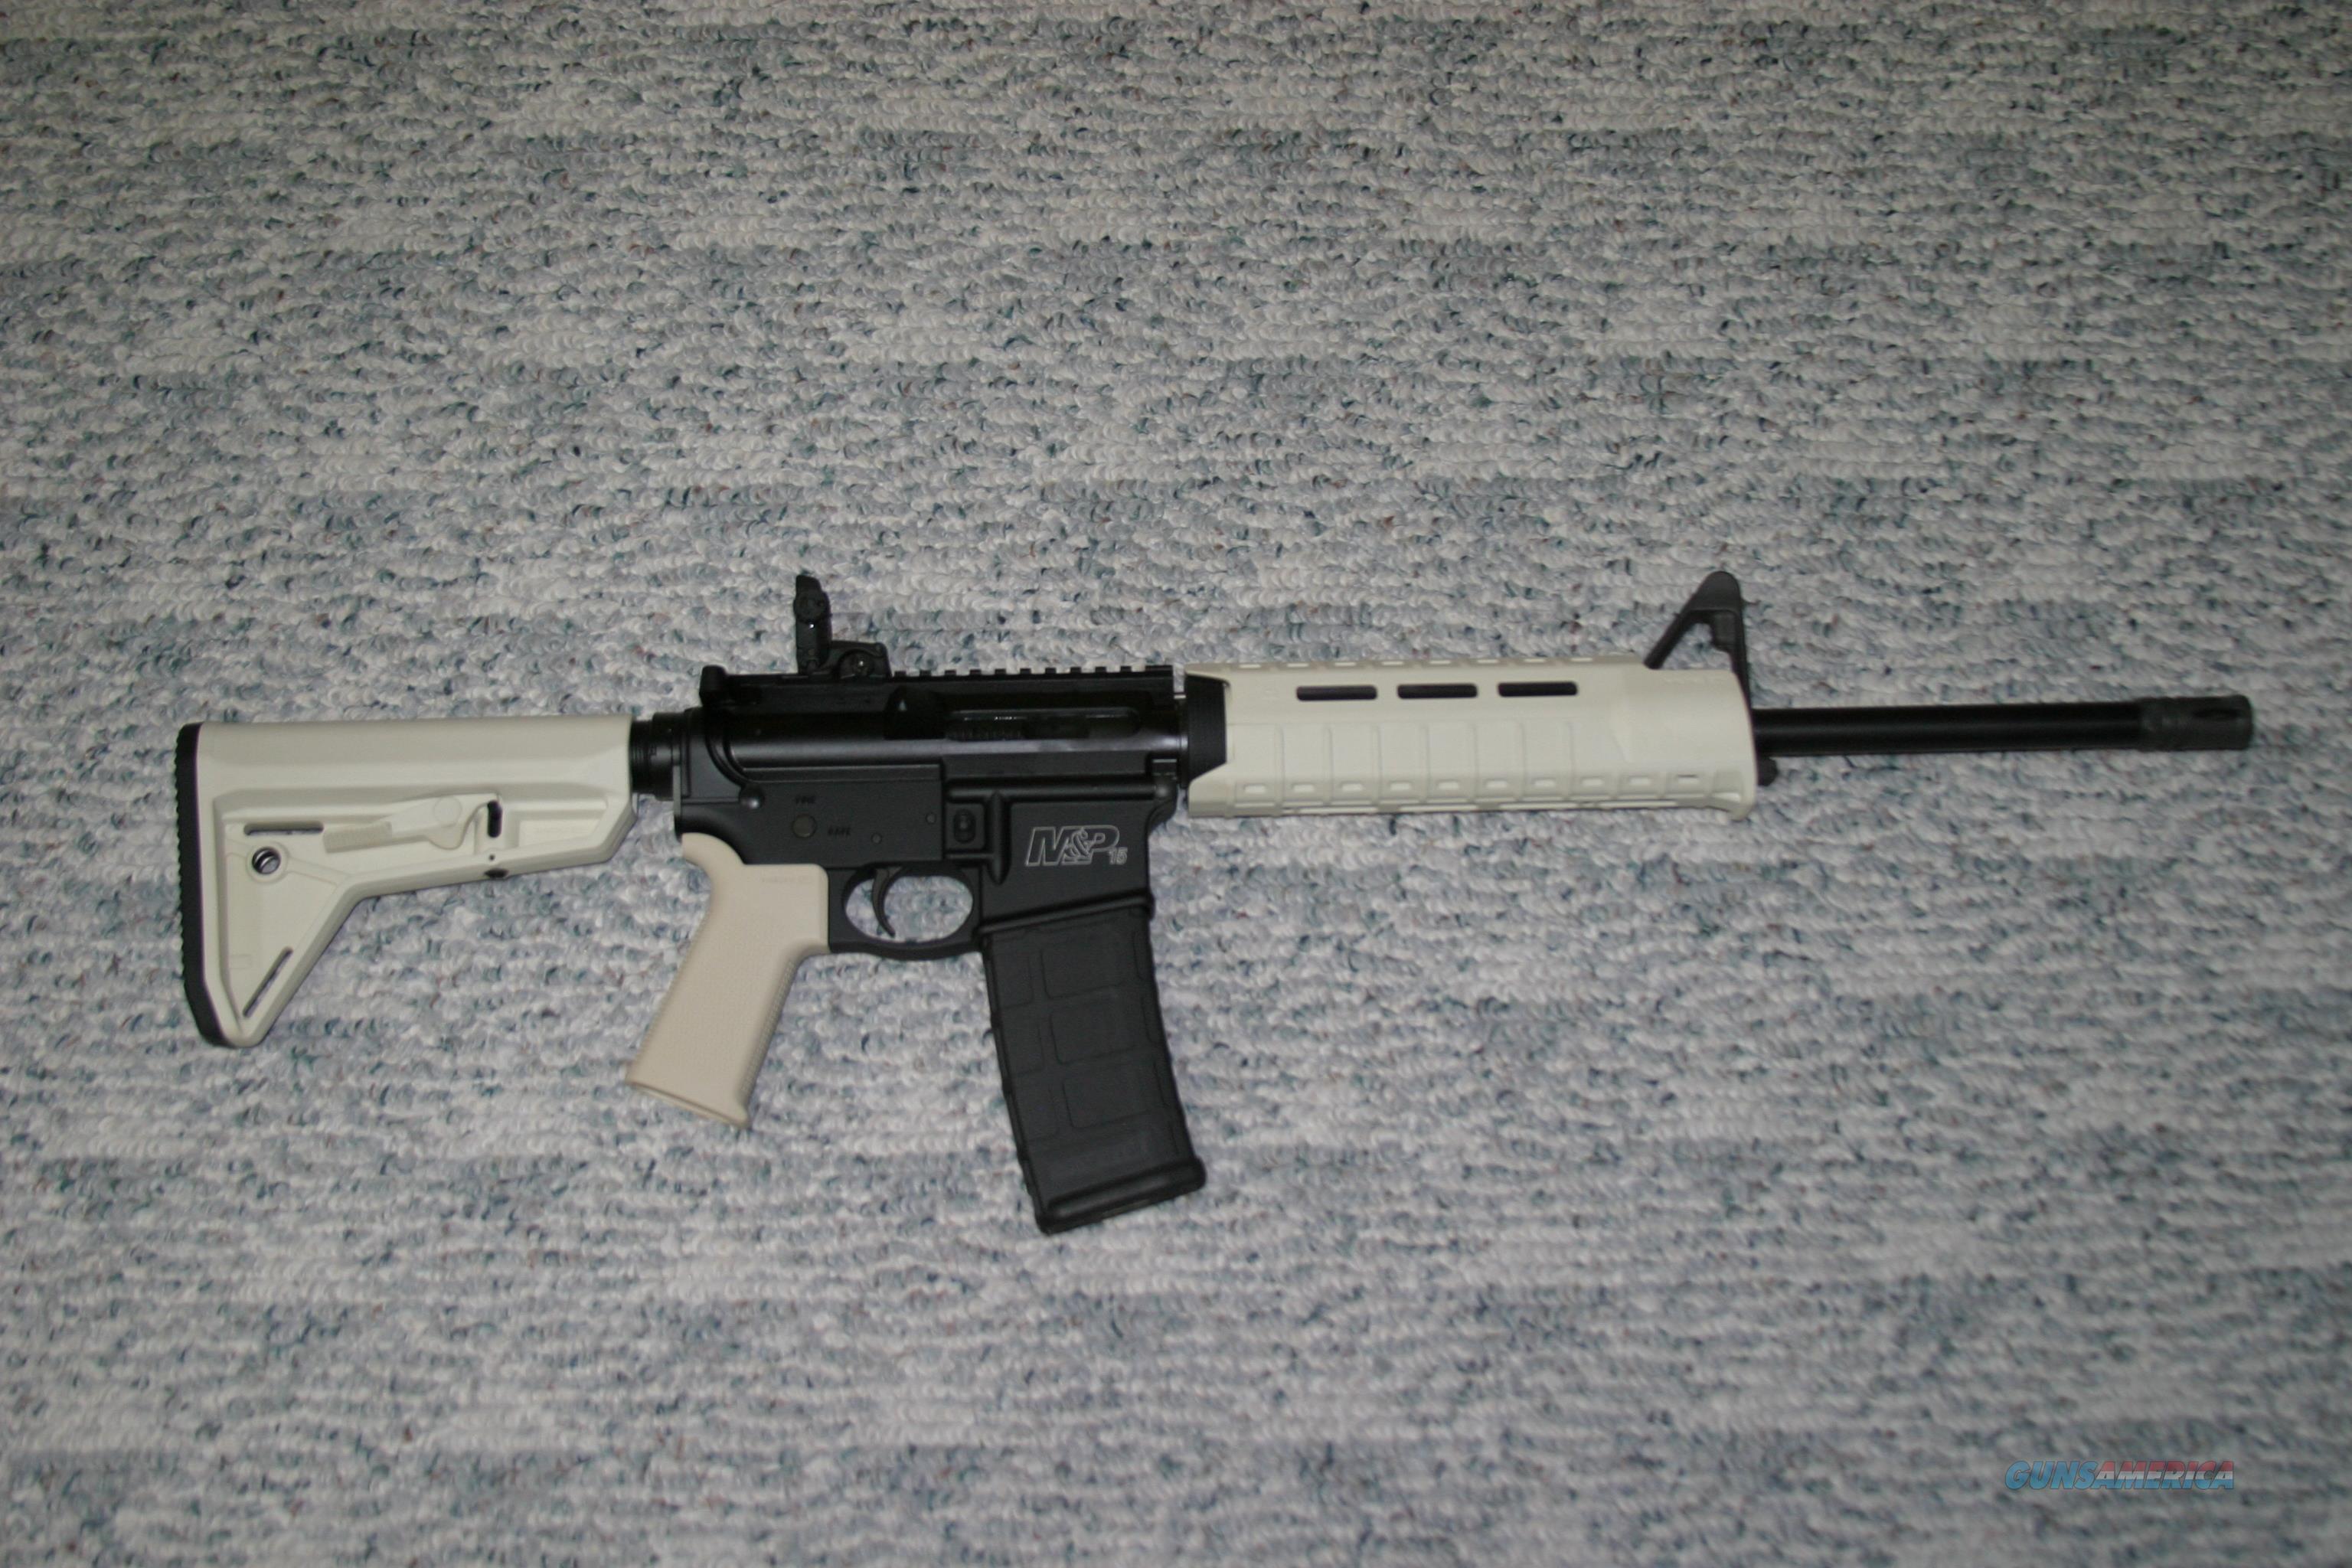 Smith & Wesson M&P15, AR15/M4, Sand Magpul  Guns > Rifles > Smith & Wesson Rifles > M&P